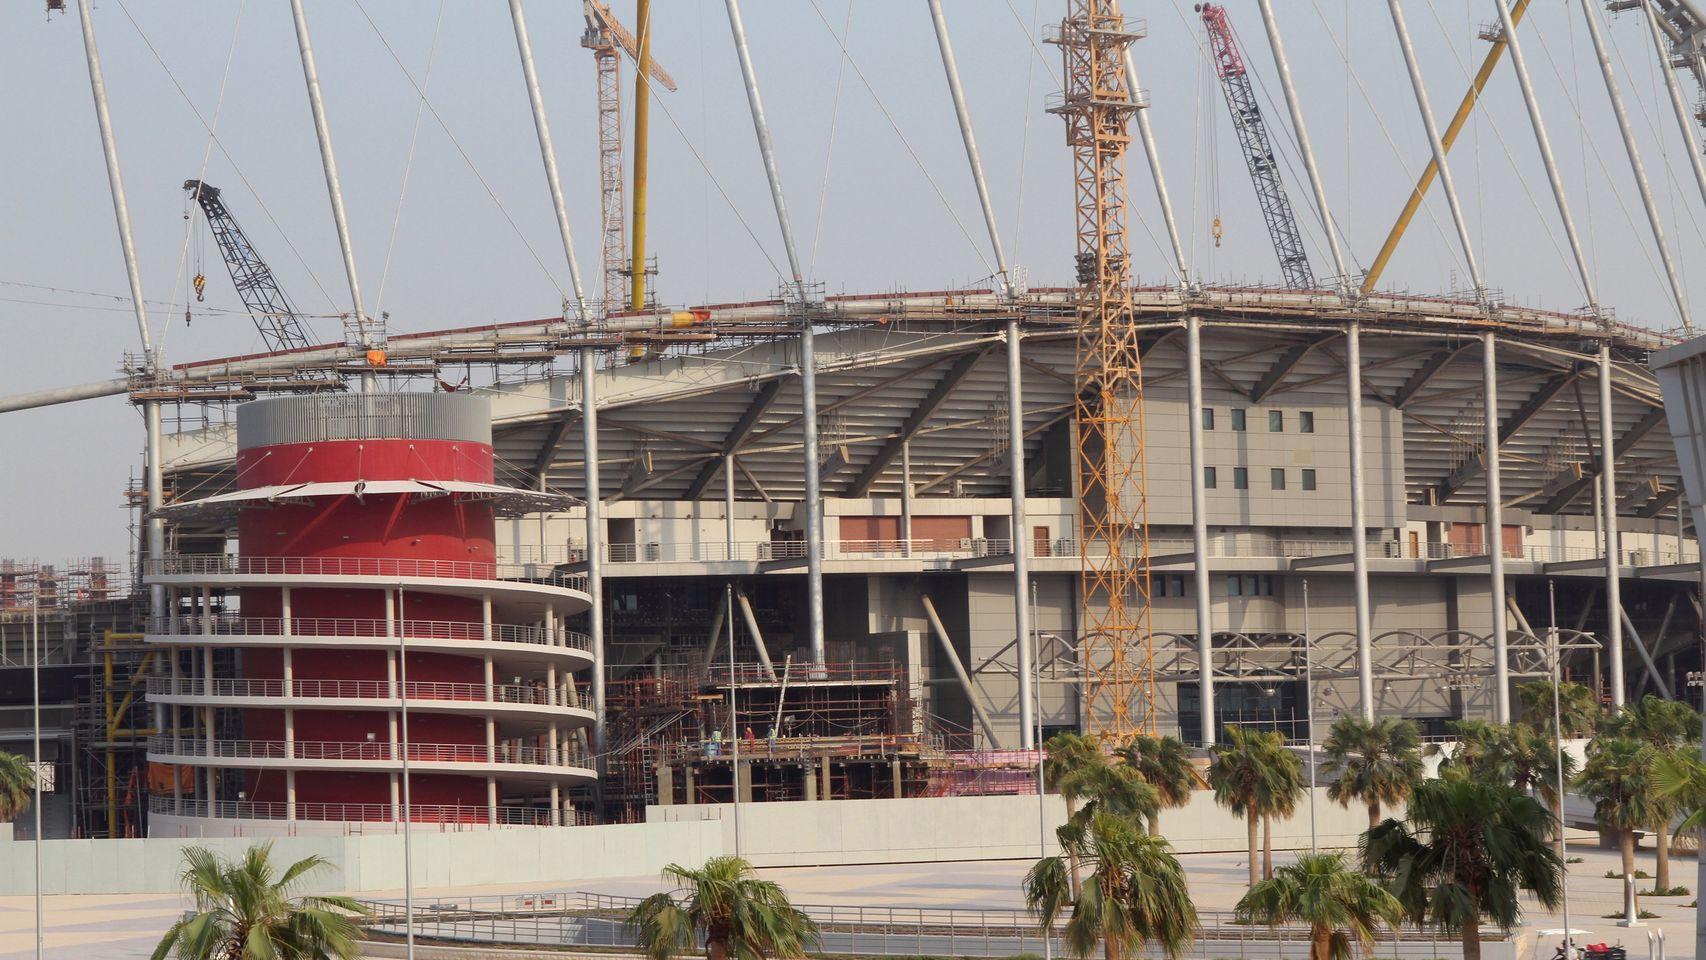 Khalifa-International-Stadium-Doha_66753372_52132_1706x960